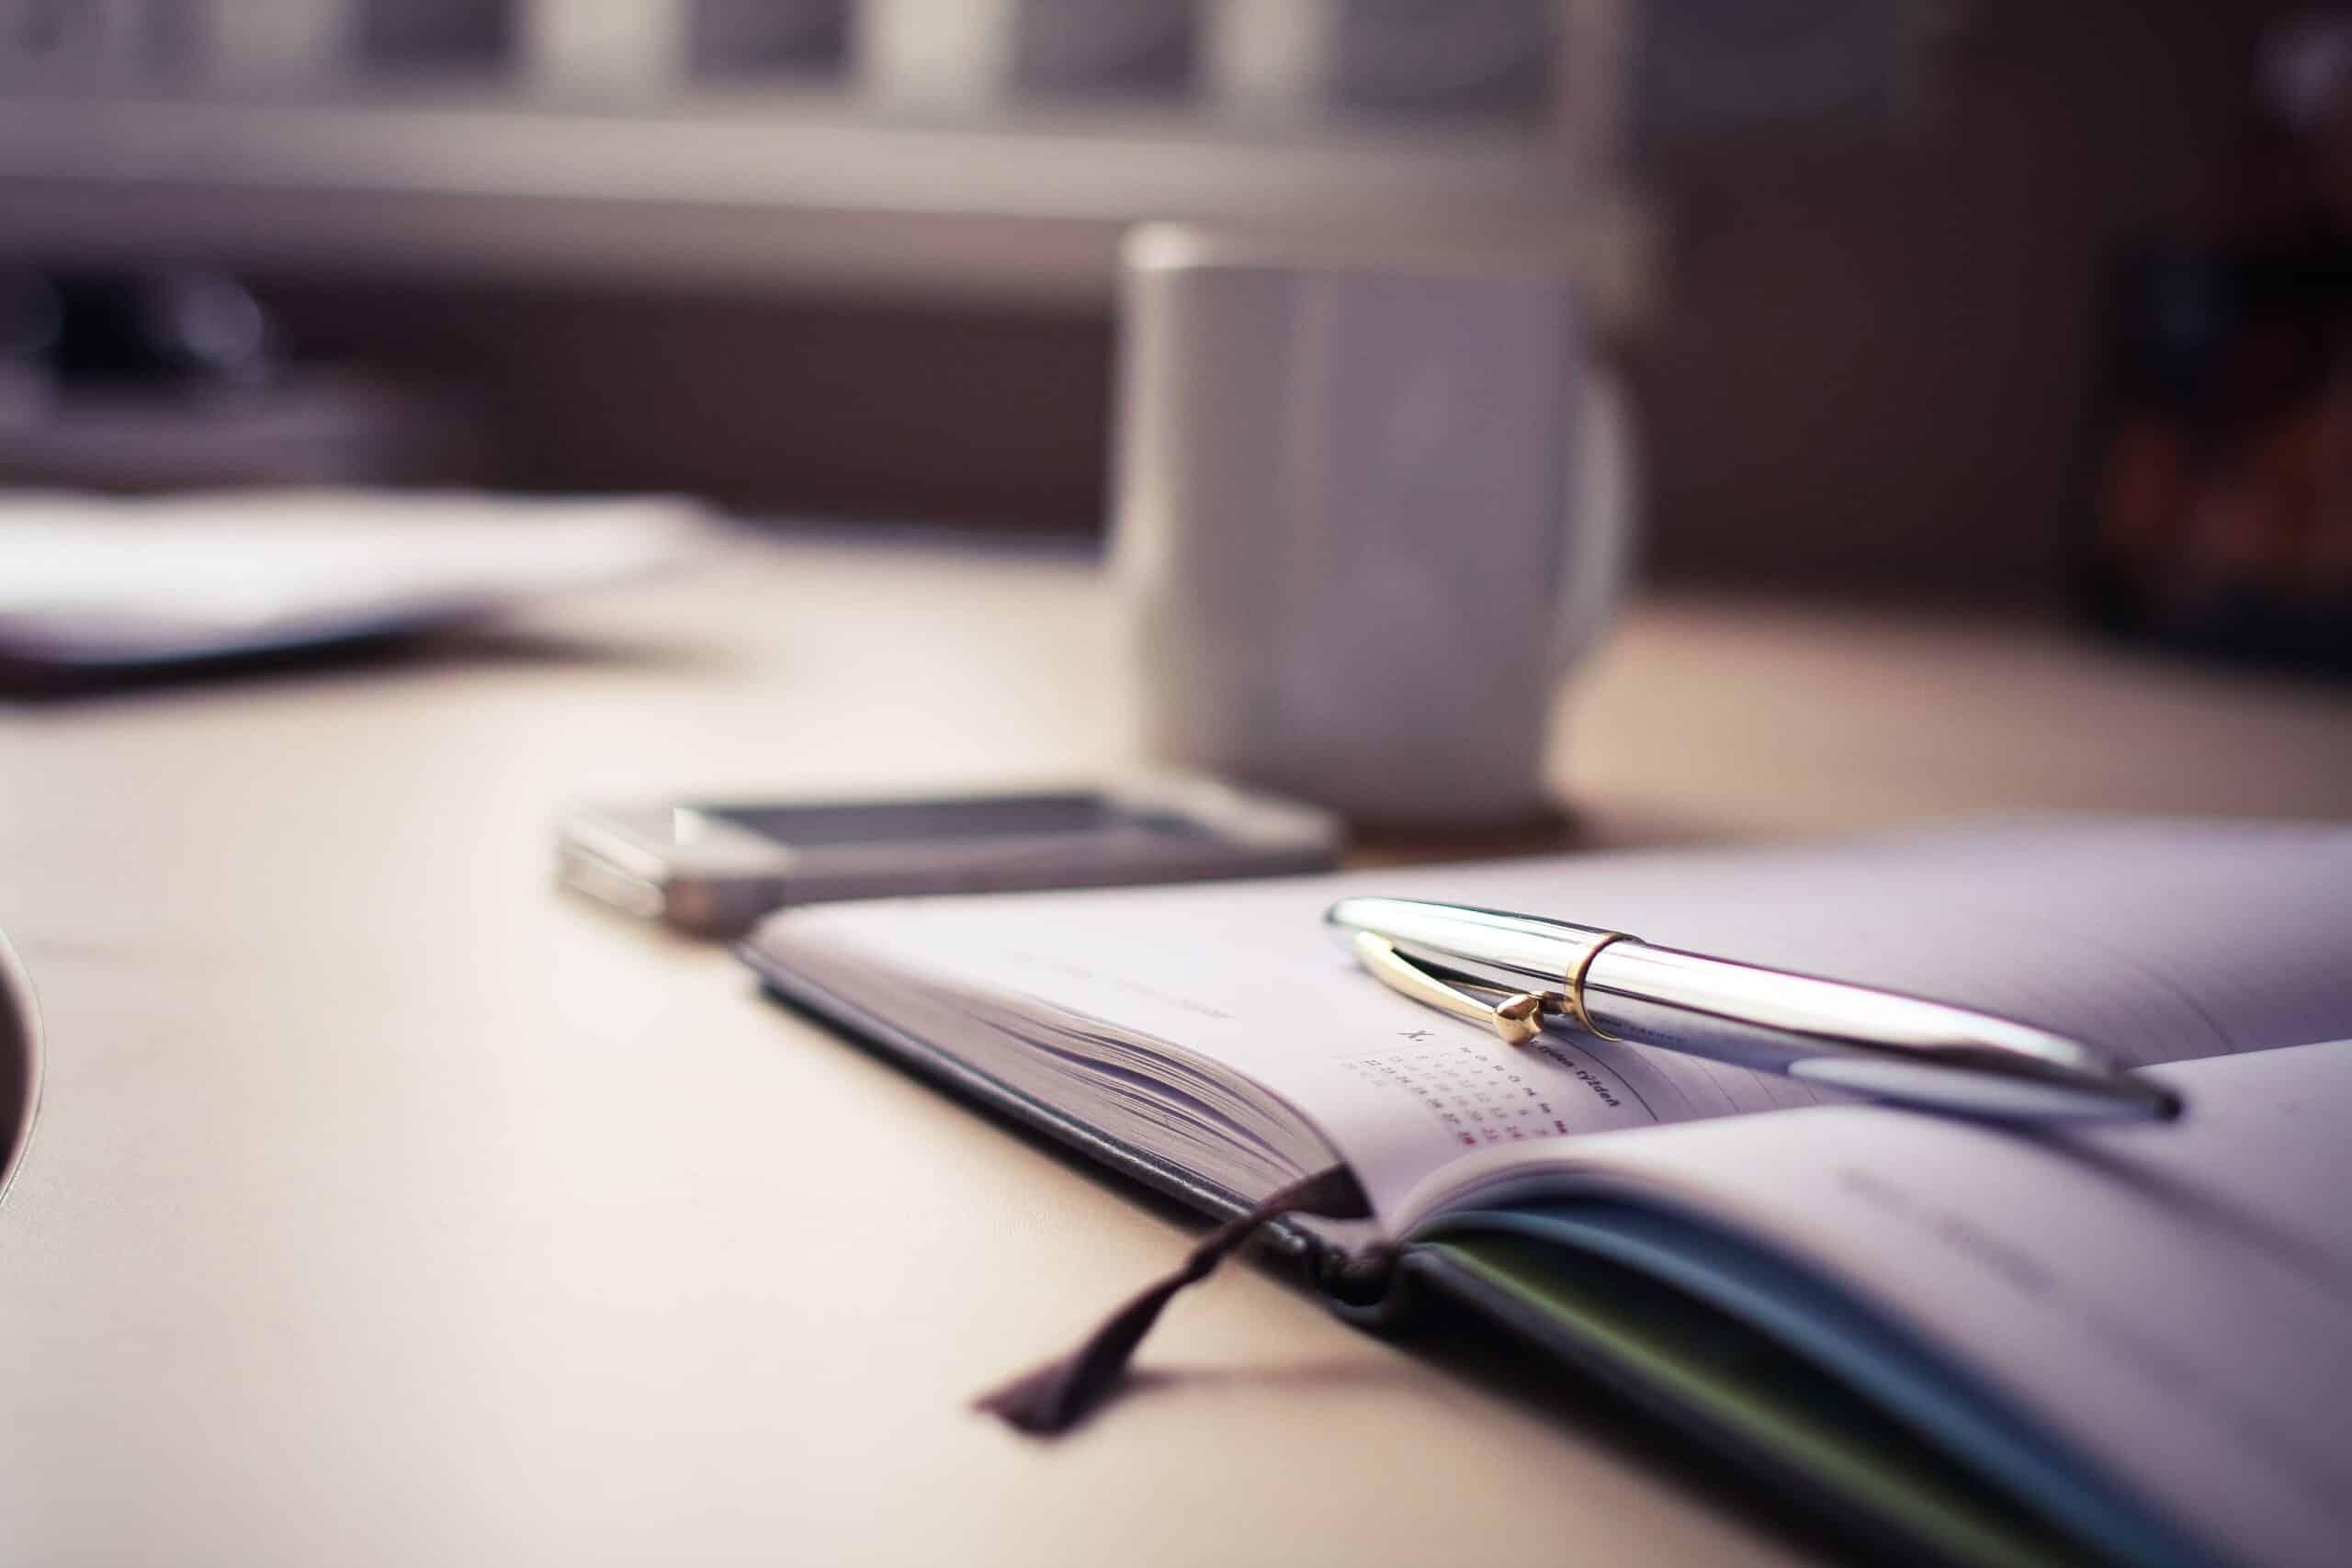 Canva - Silver Click Pen on Open Book (3)